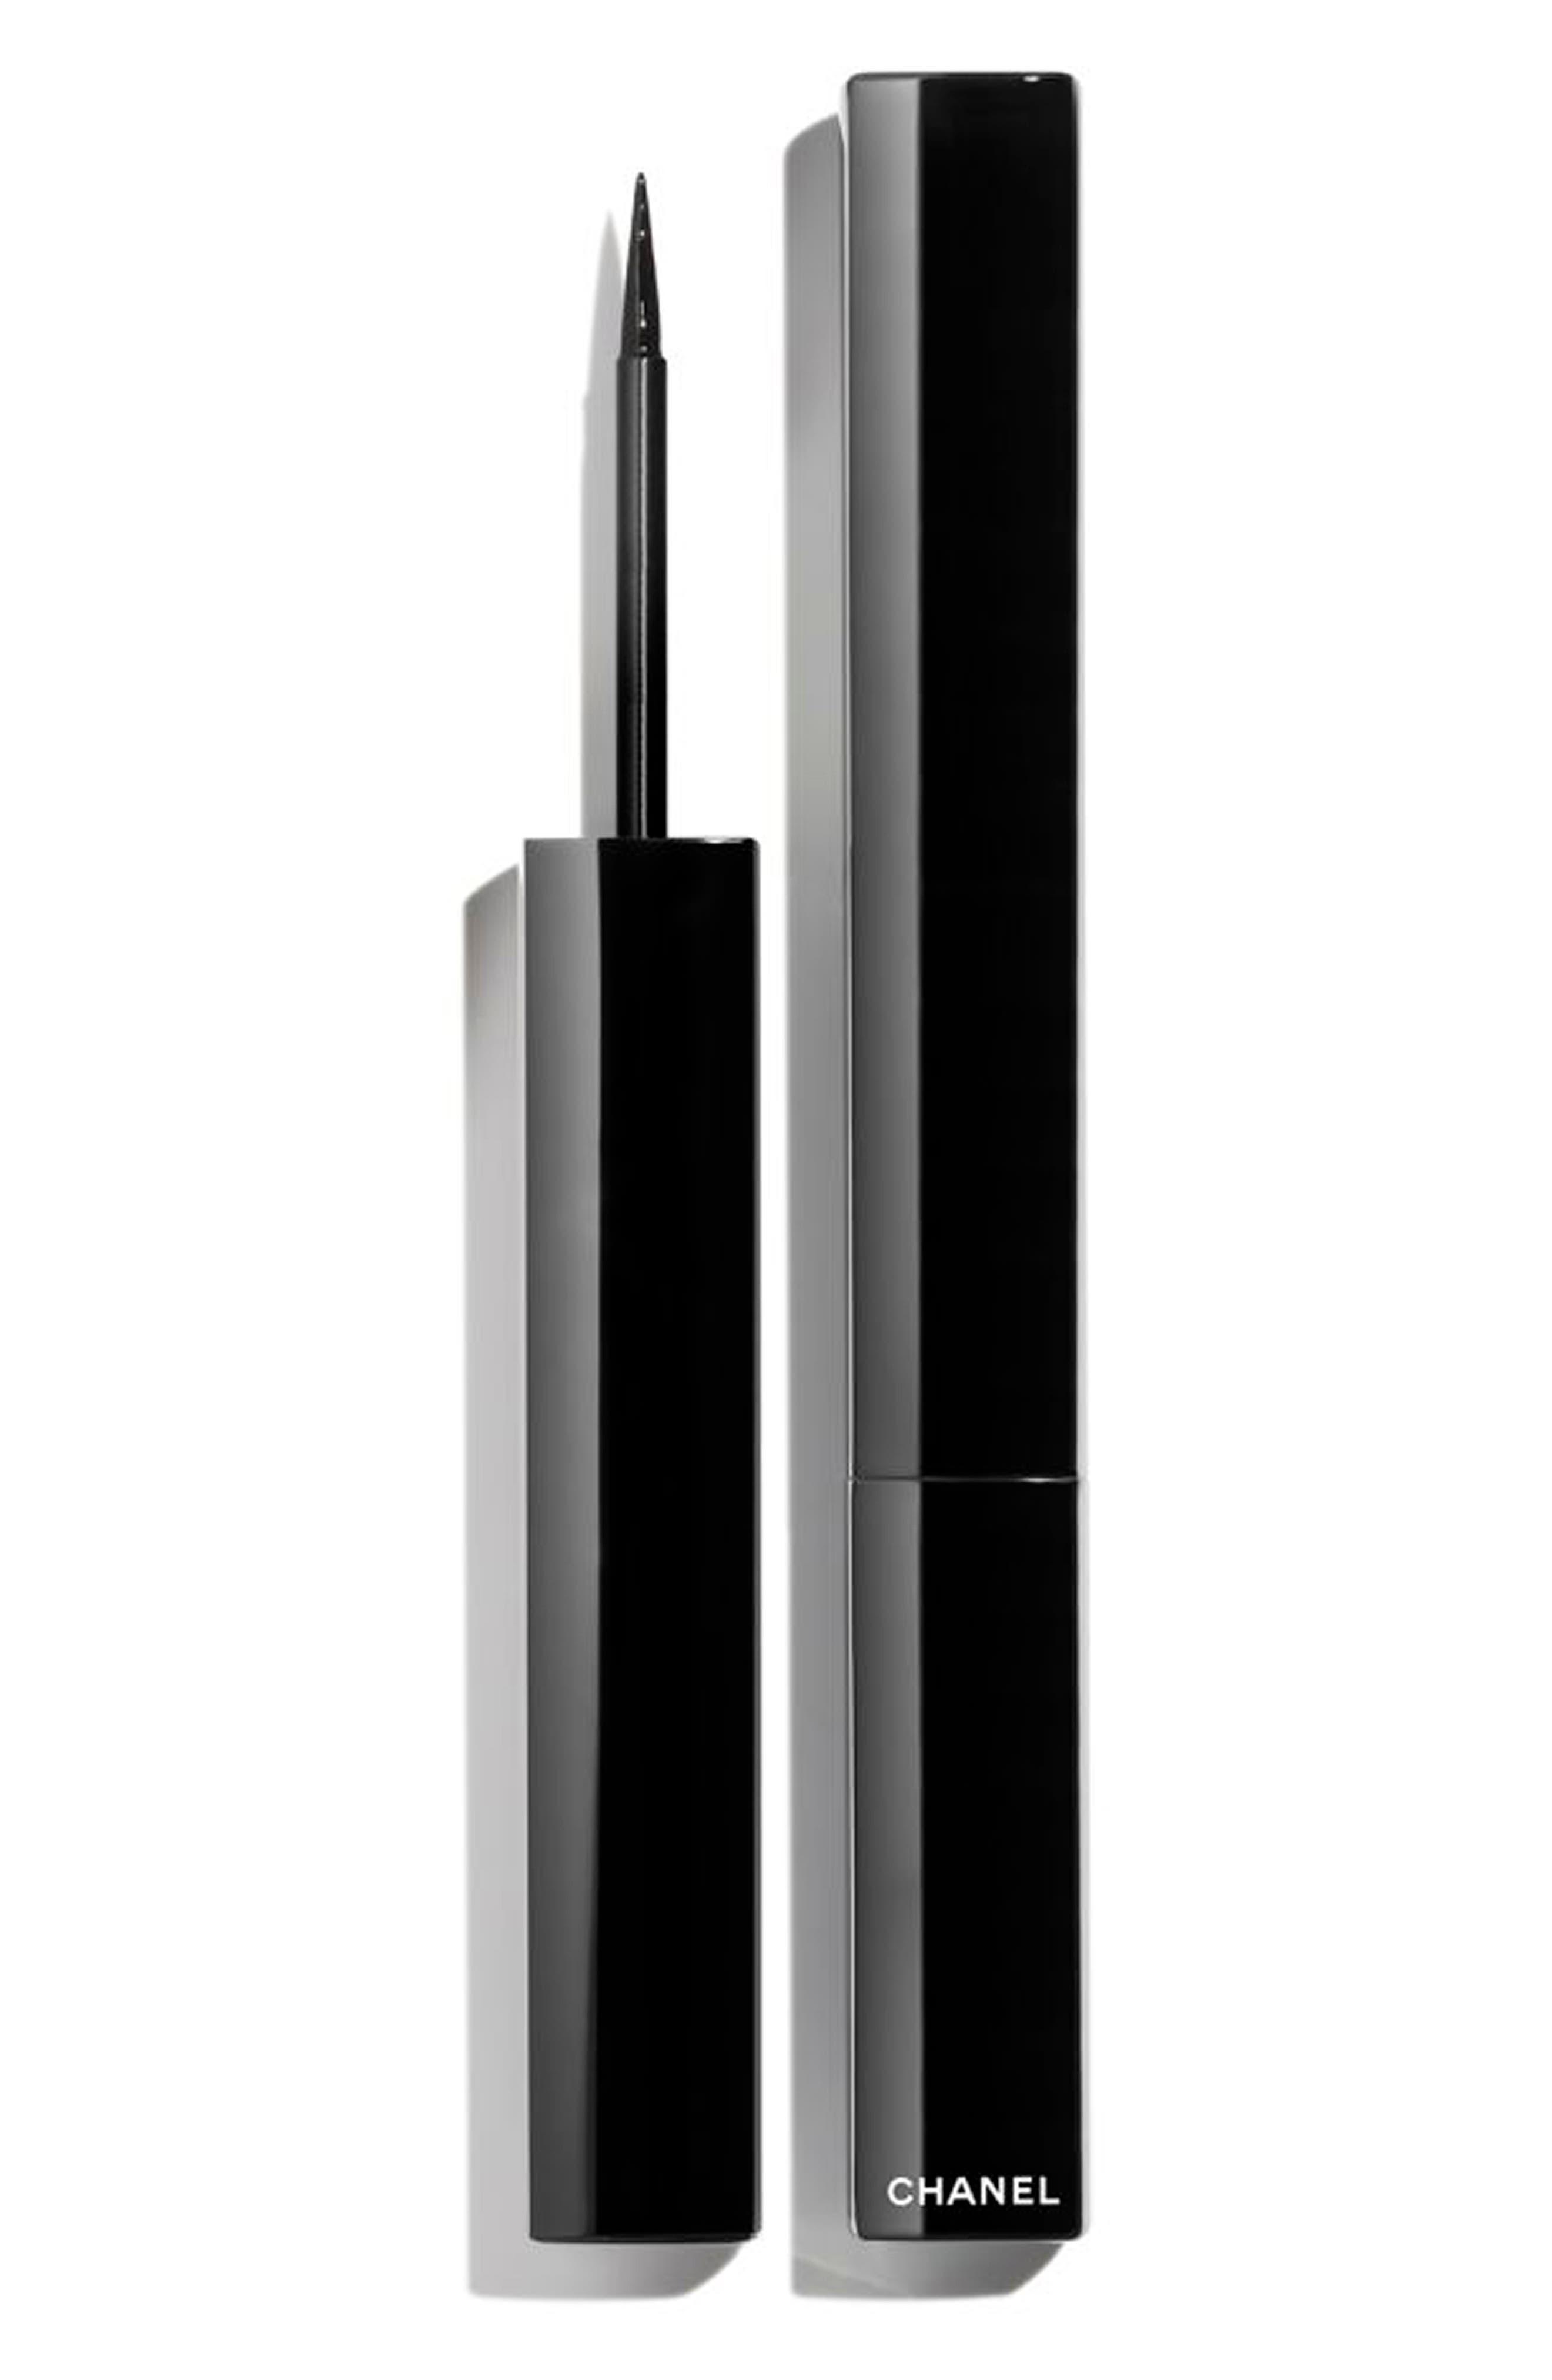 CHANEL LE LINER DE CHANEL  Liquid Eyeliner   Nordstrom